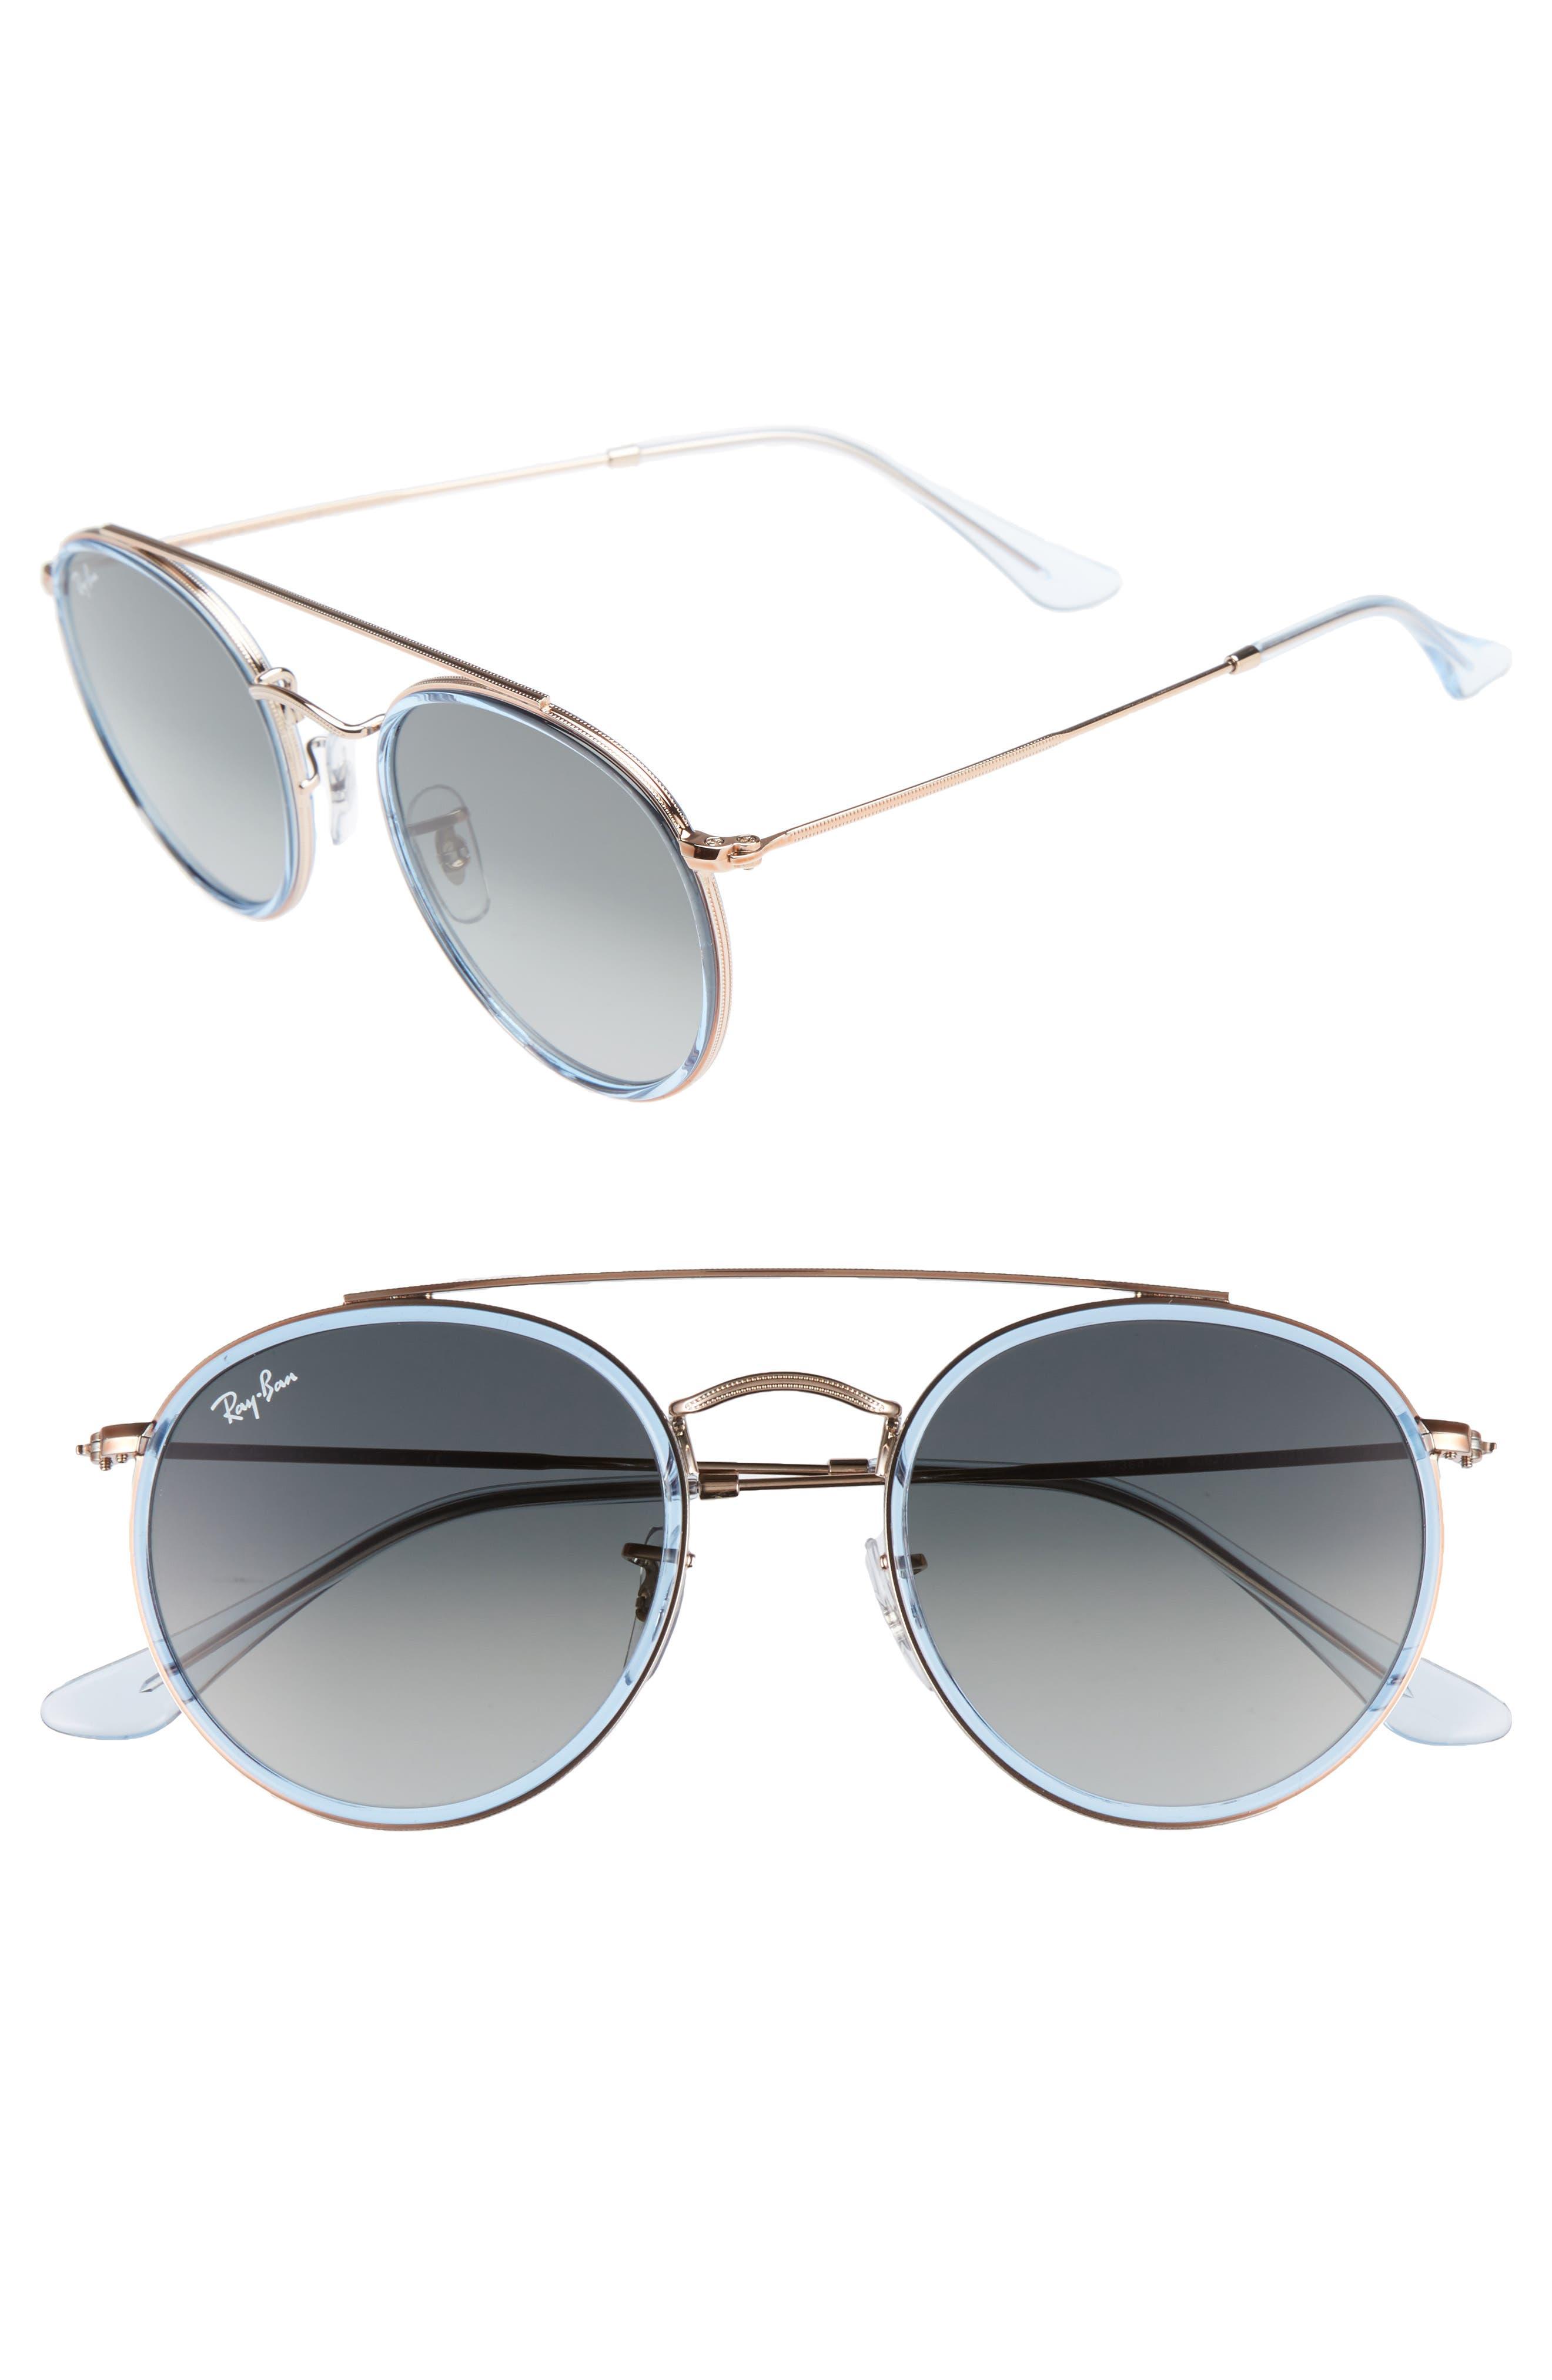 Ray-Ban 51mm Aviator Gradient Lens Sunglasses